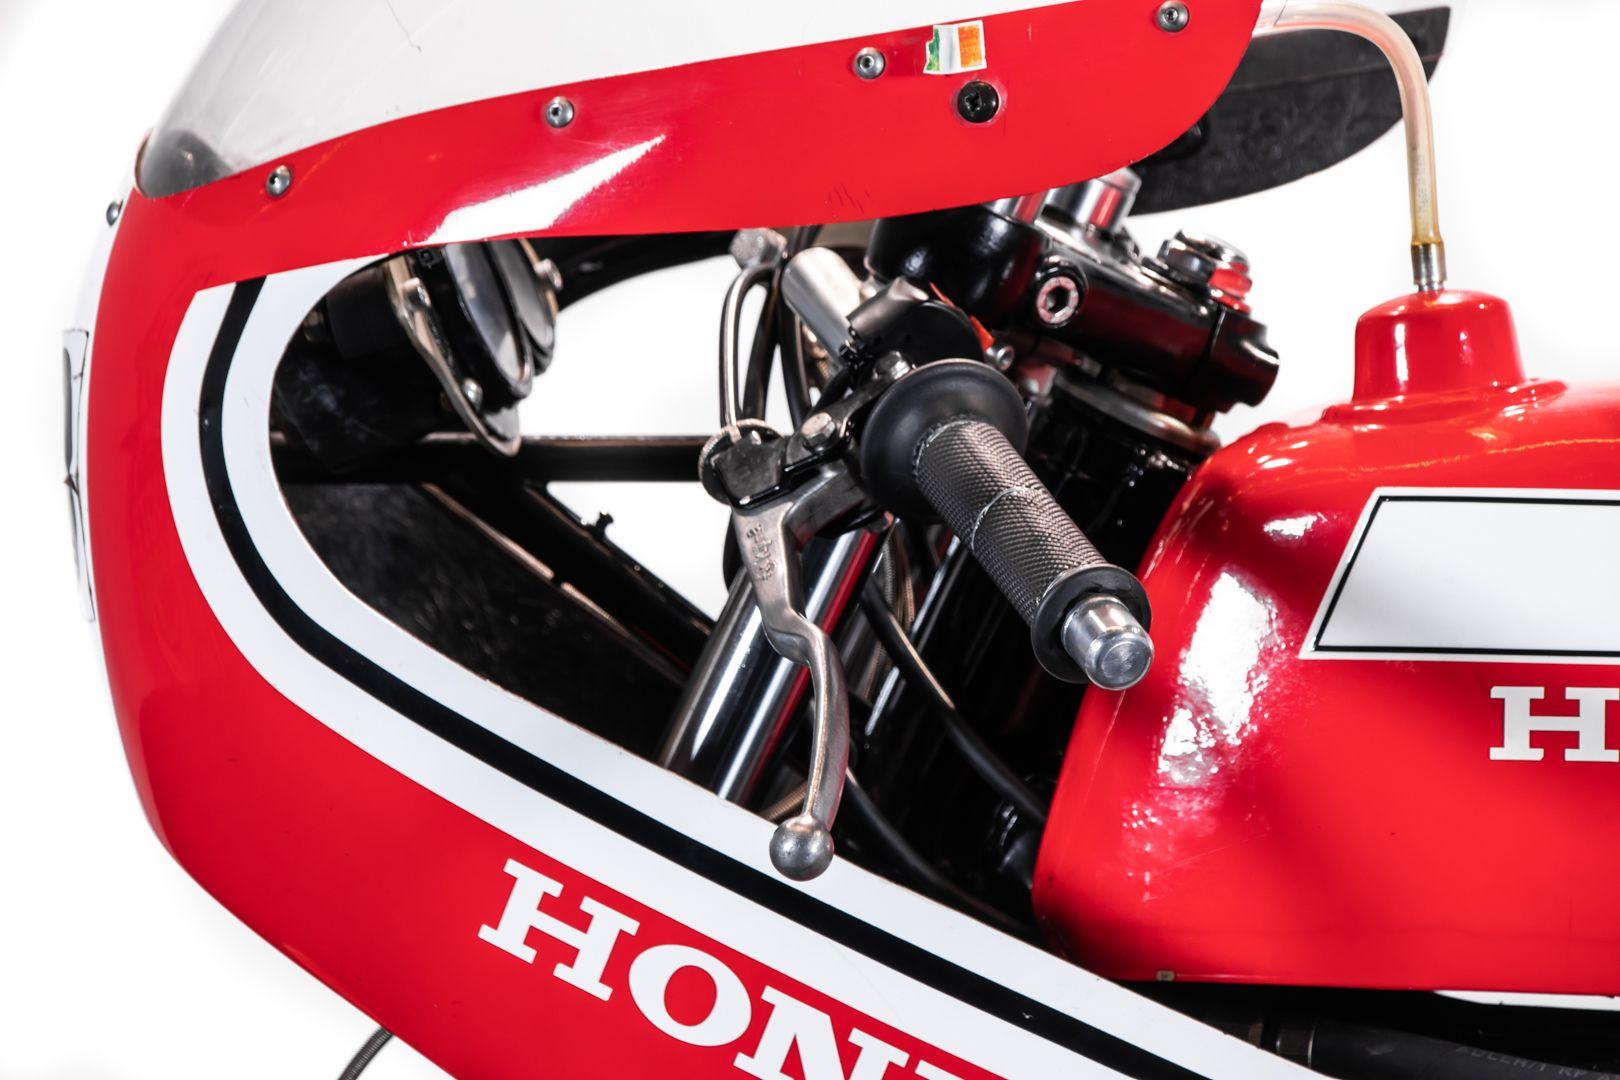 1973 Honda 750 Daytona Replica 72310